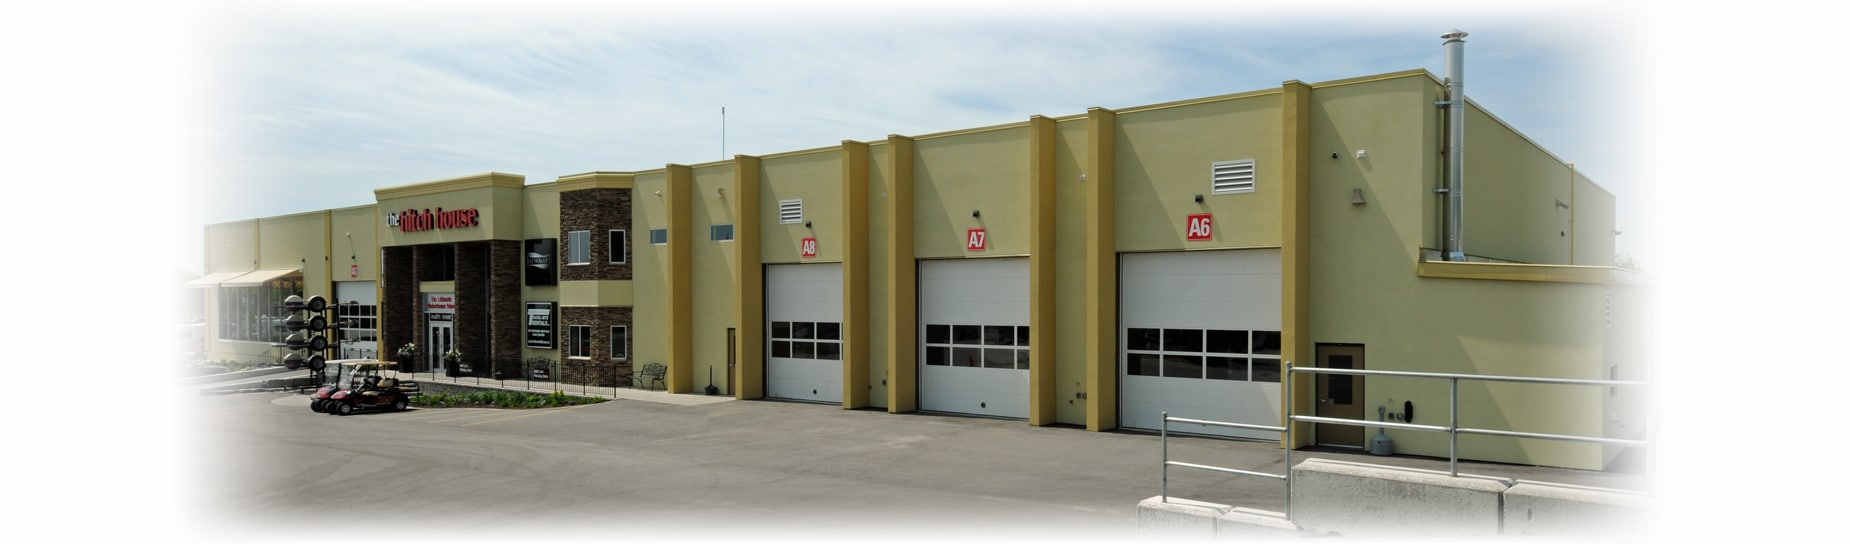 The Hitch House Rv Motorhome Dealership Near Toronto Ontario Ca Trailer Wiring Harness Cruise America Previous Next